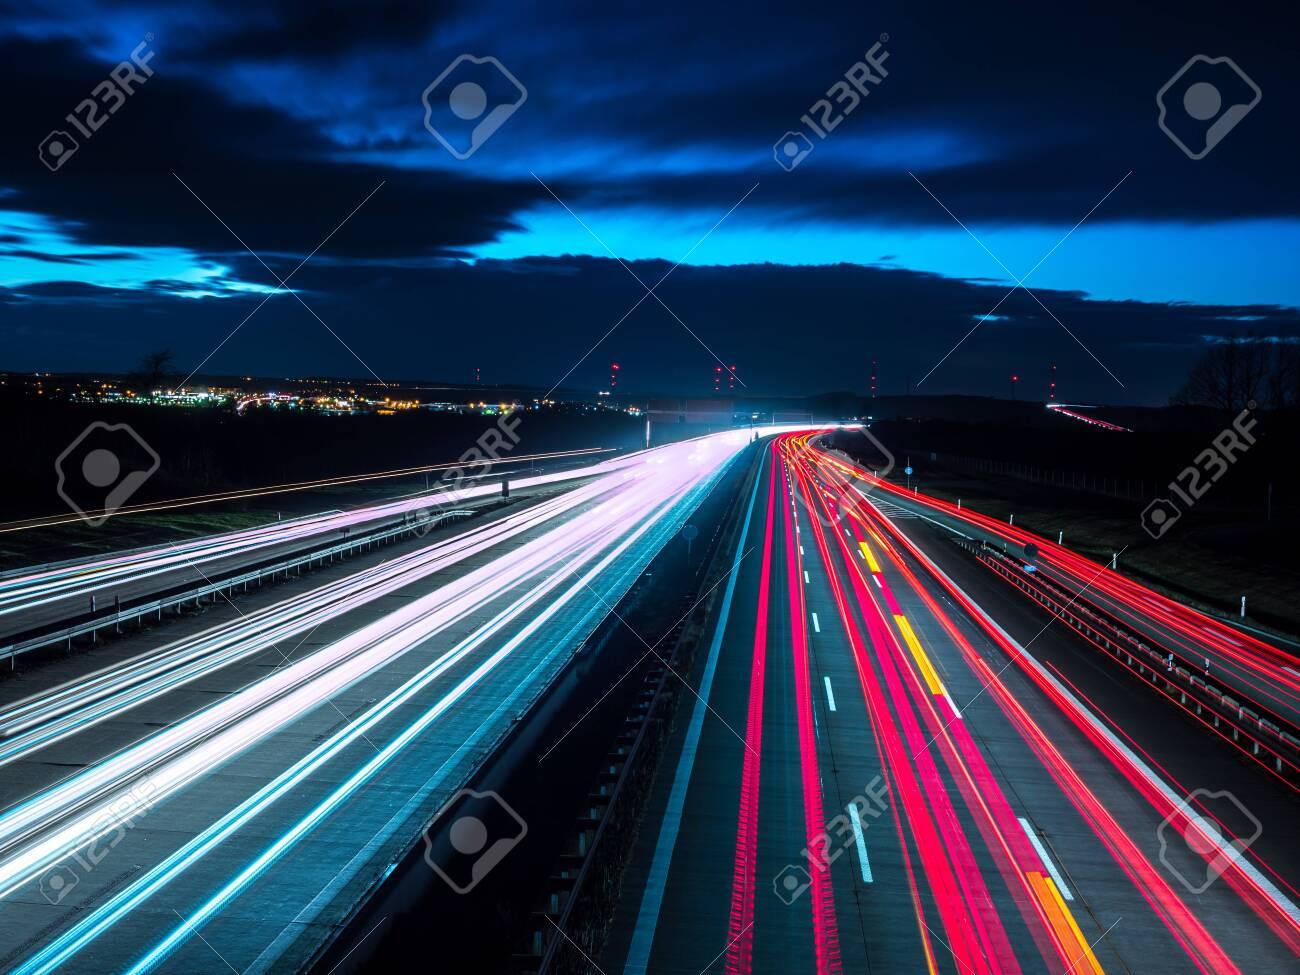 Night traffic on highway - 137792663